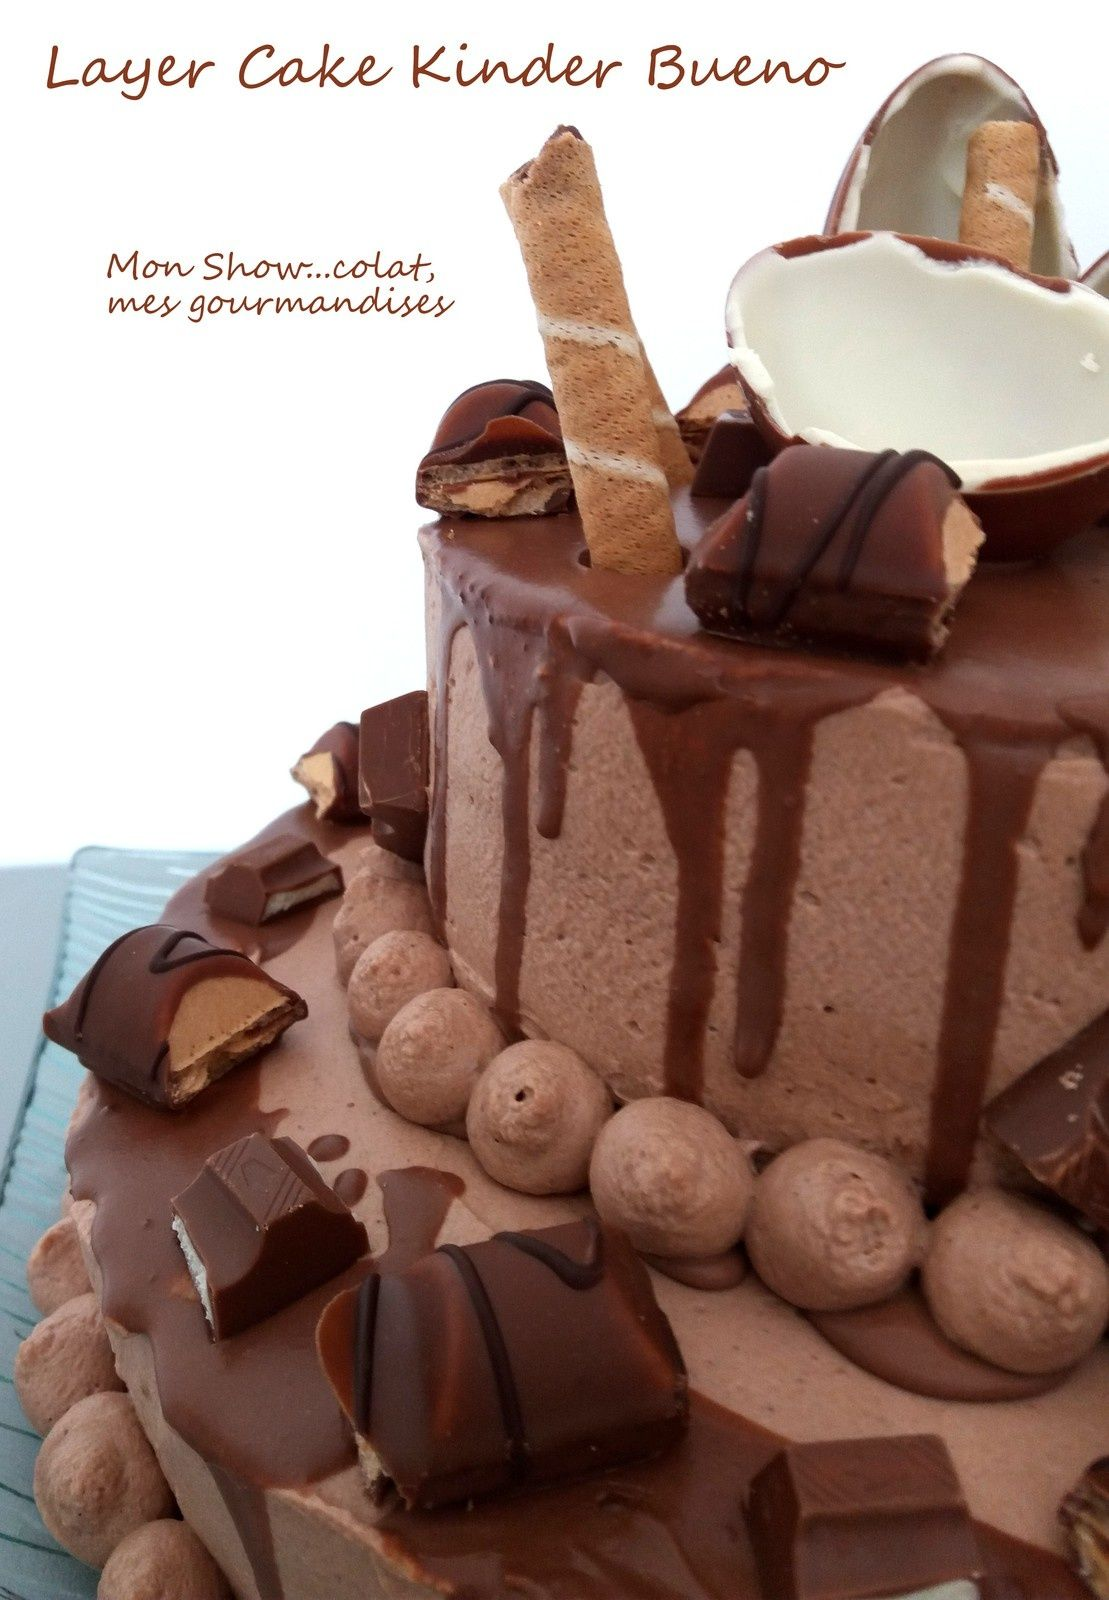 Pièce Montée Layer Cake au Kinder Bueno   Recette layer cake